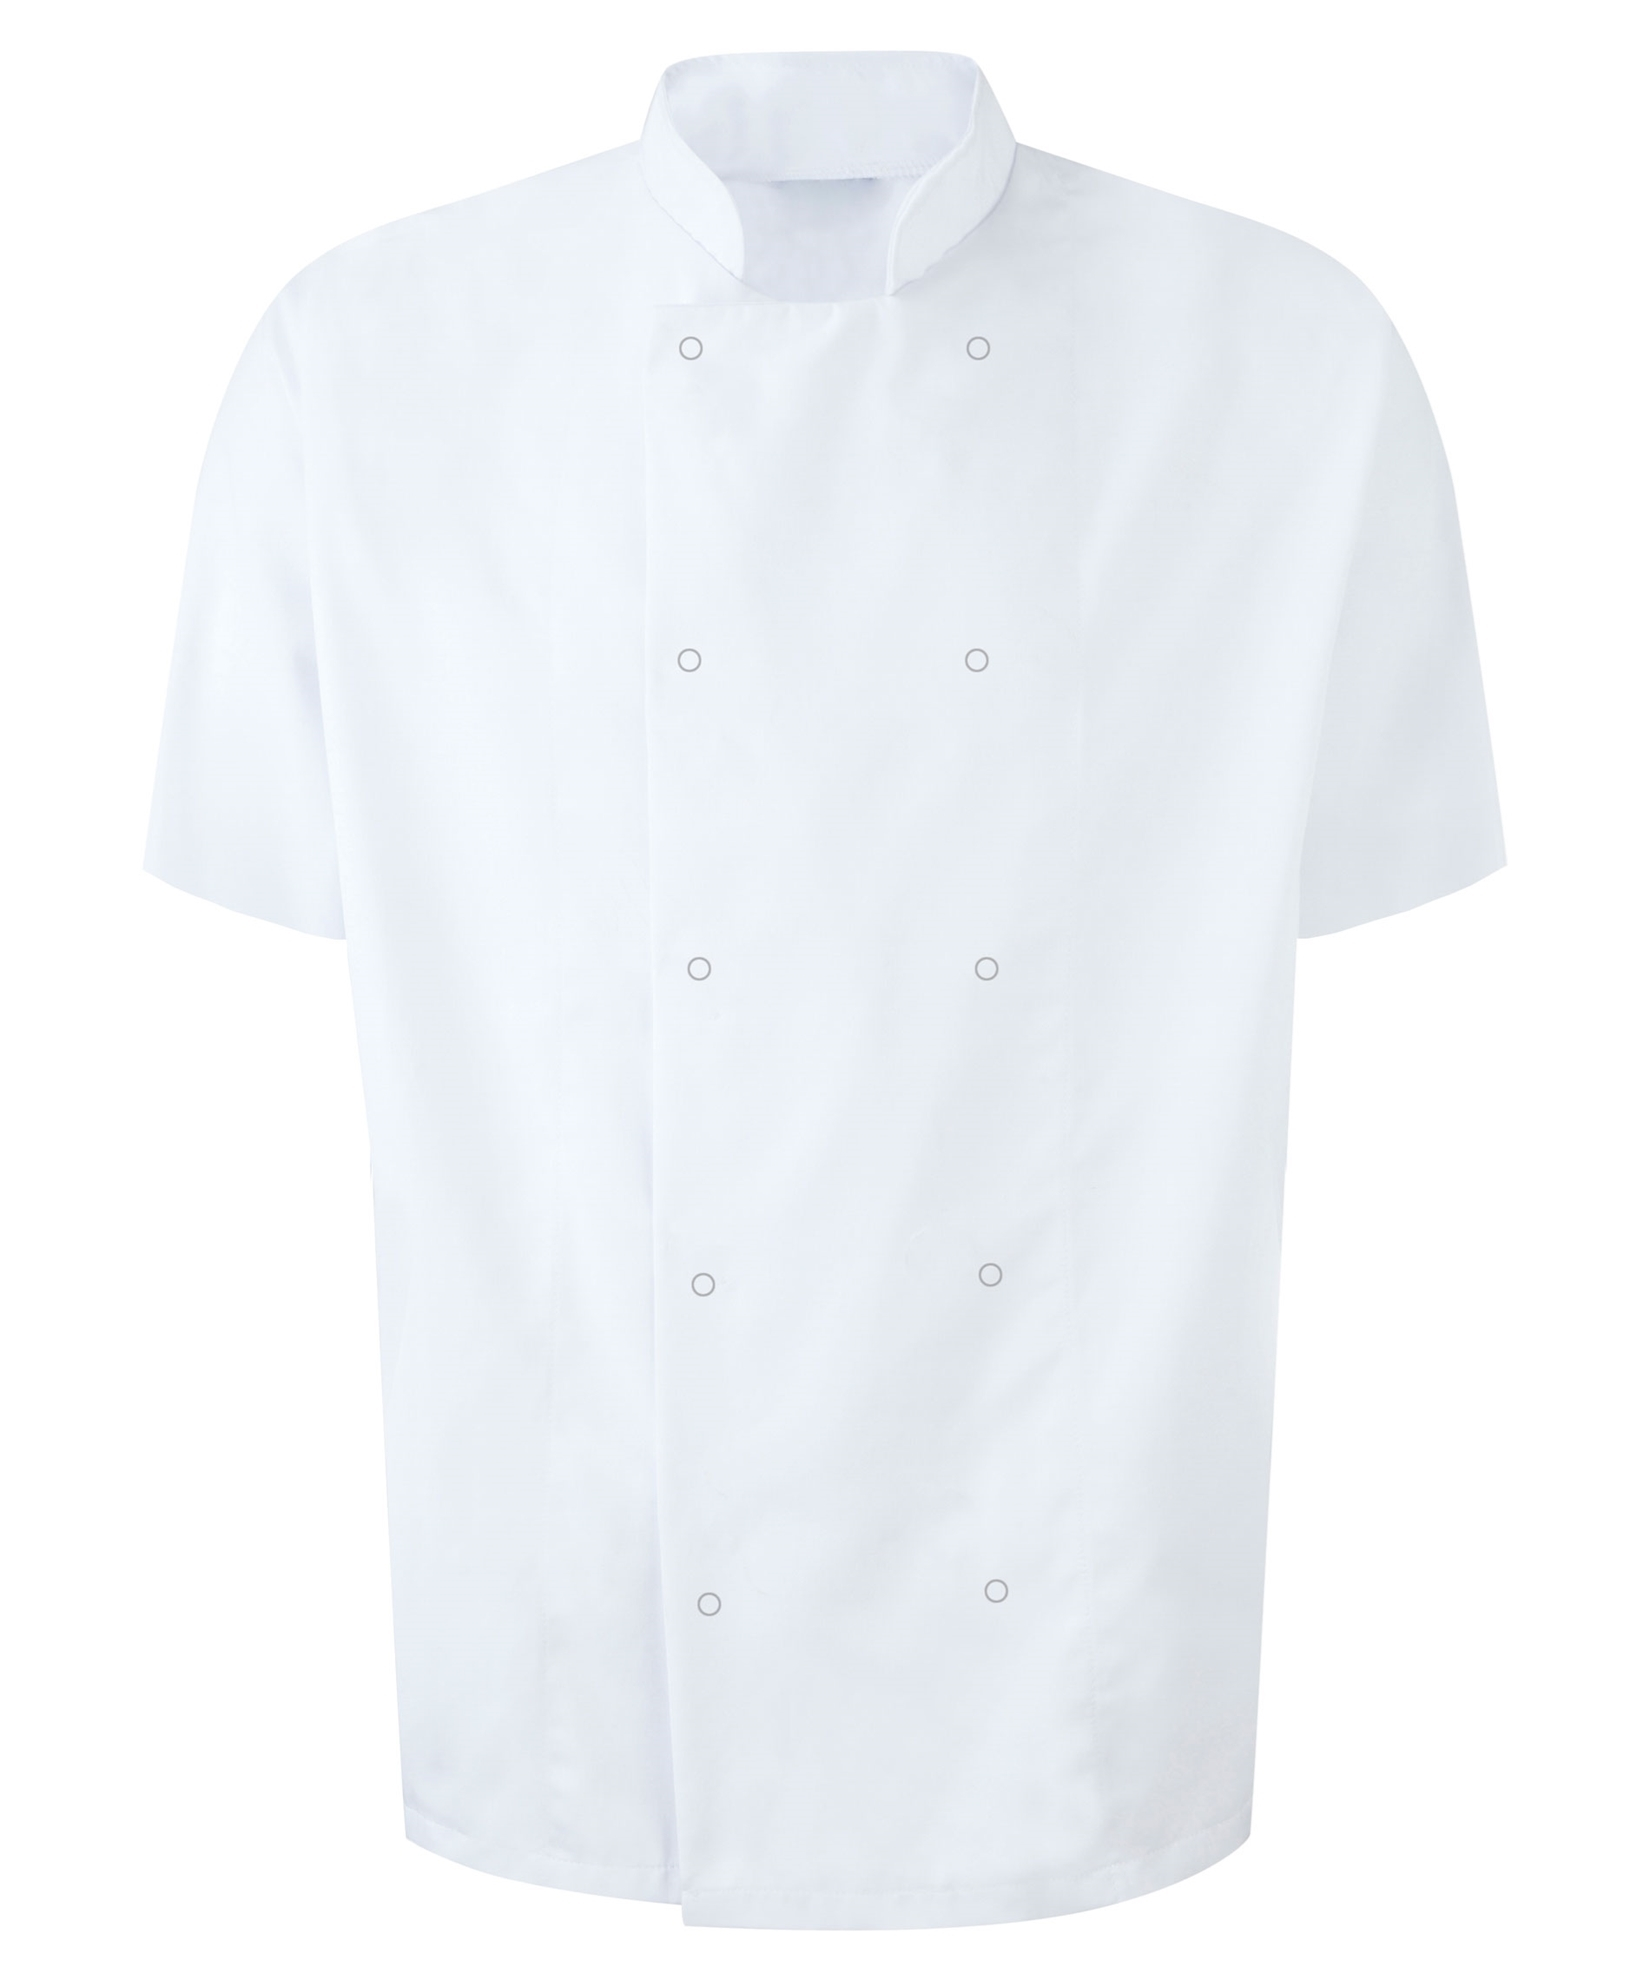 Picture of Unisex Short Sleeve Studded Chefs Jacket - White